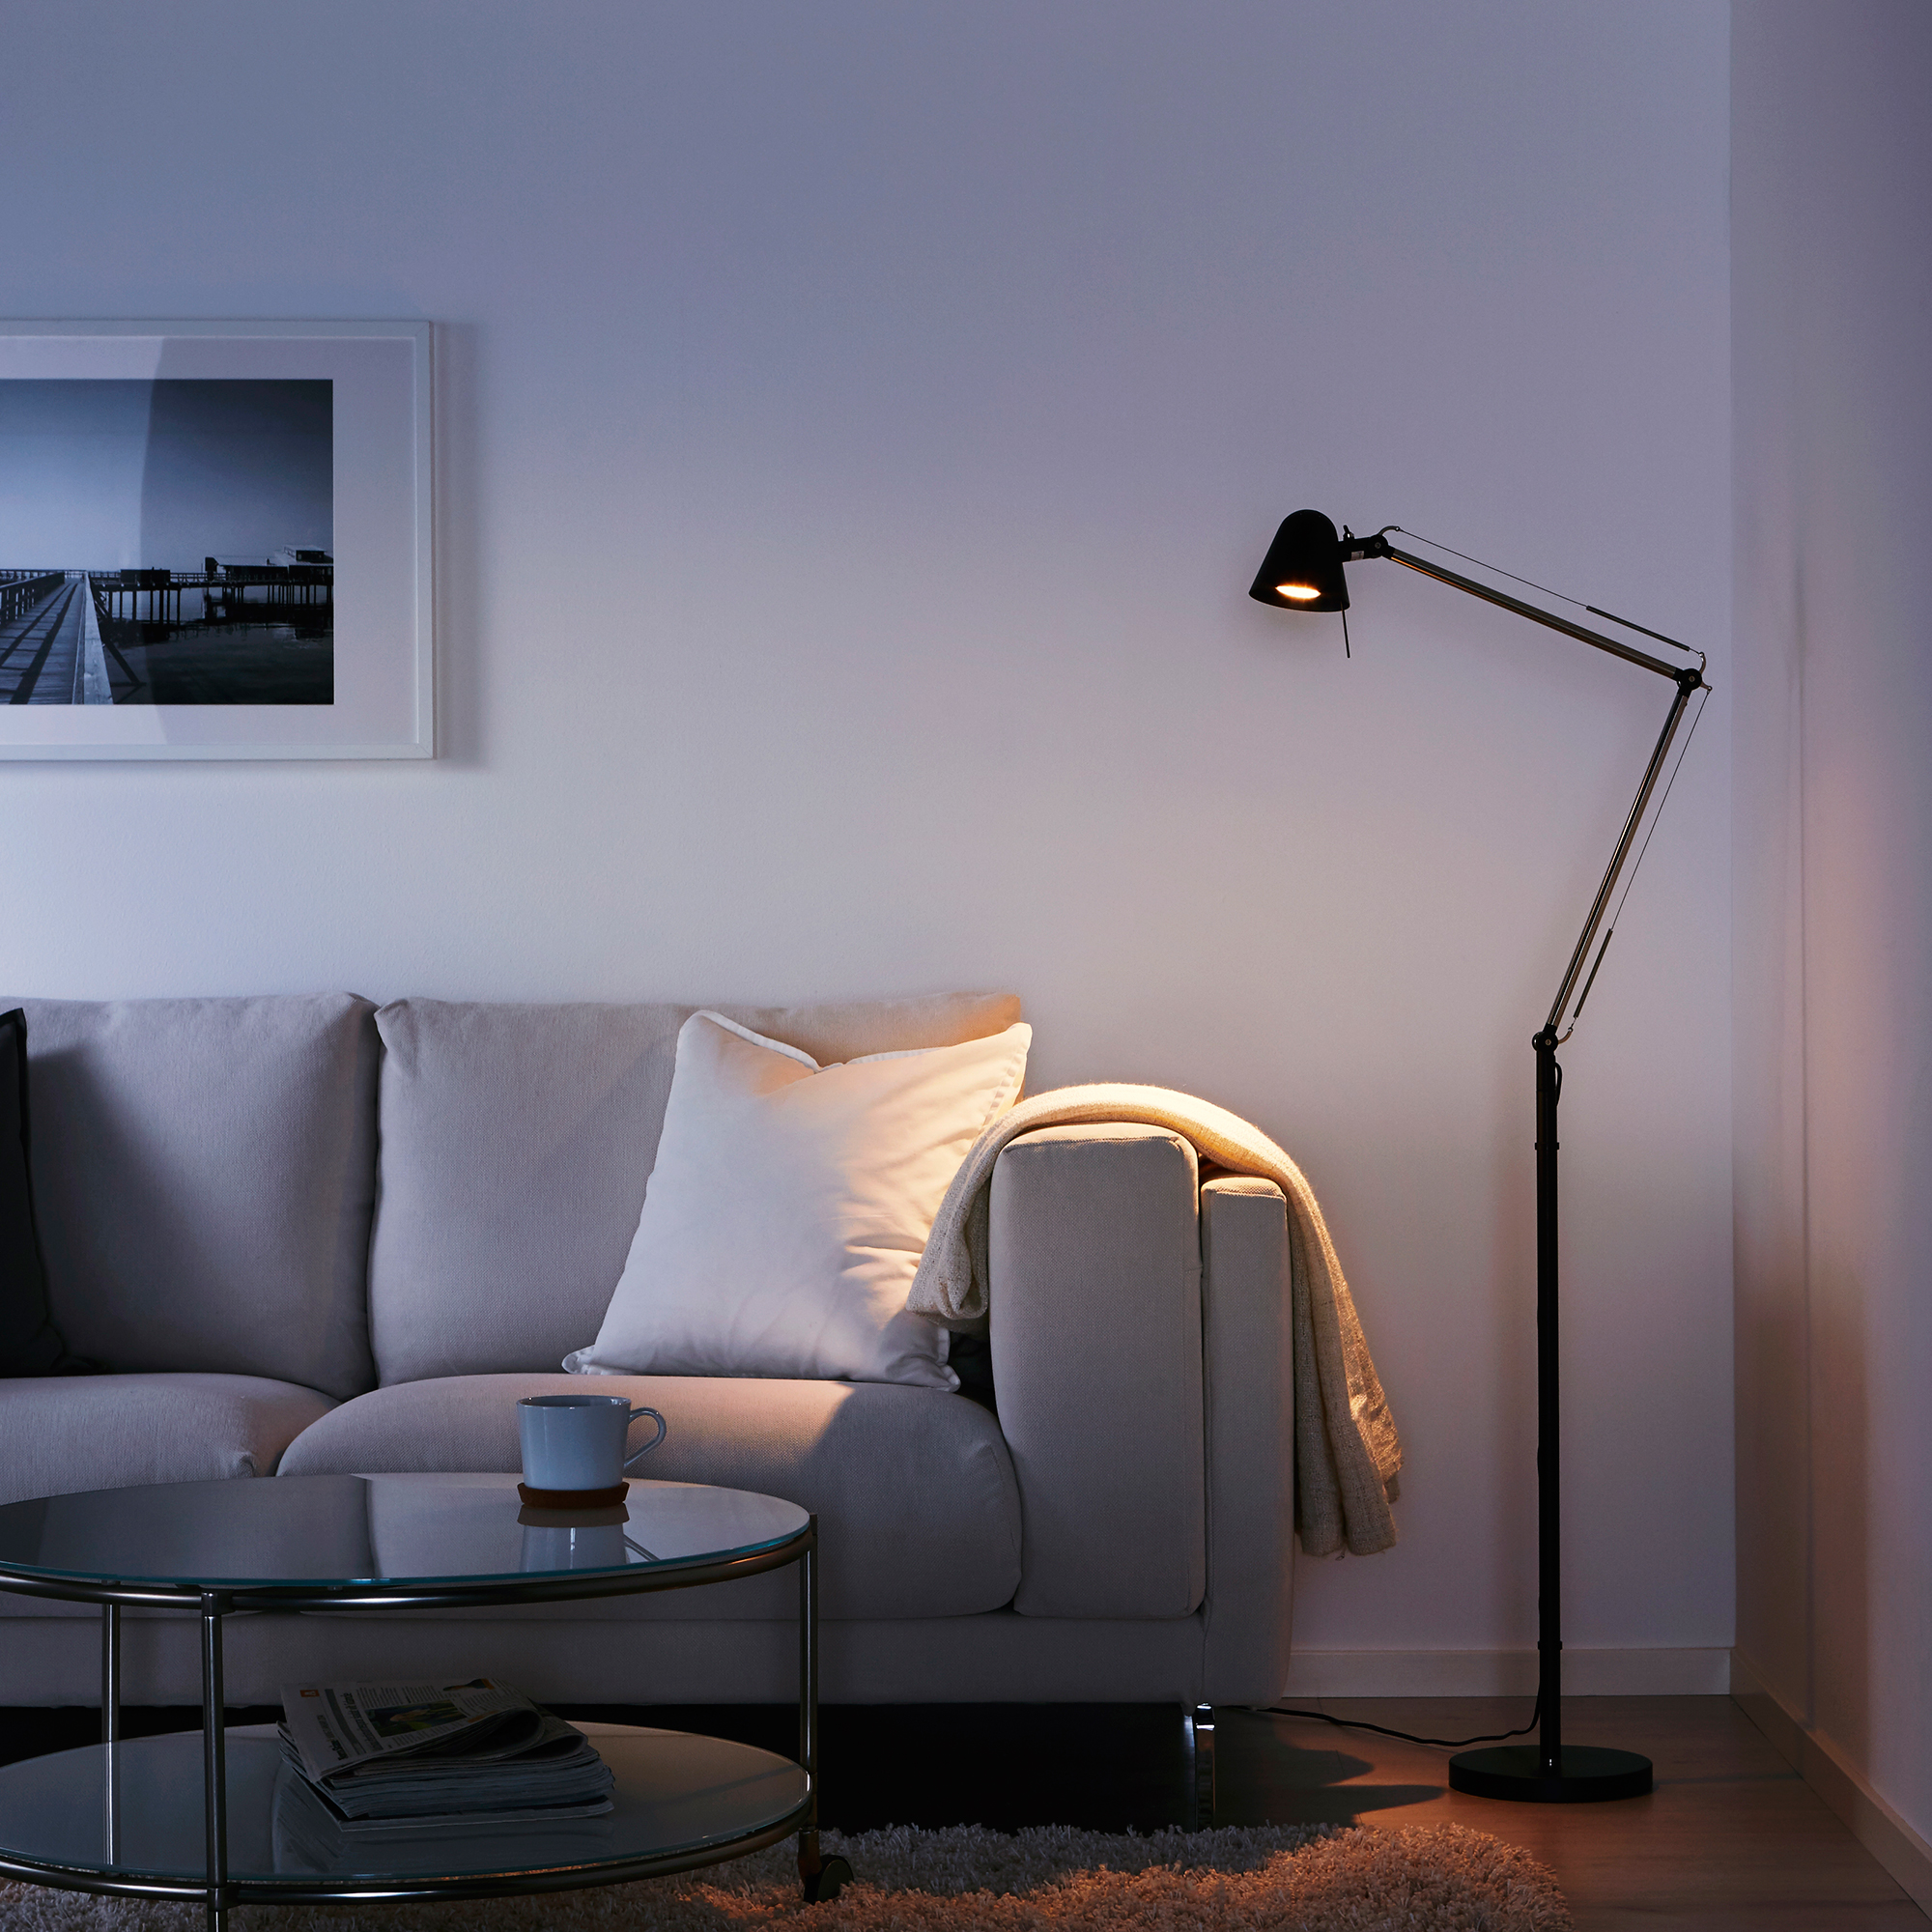 Ikea led lamp Uppbo